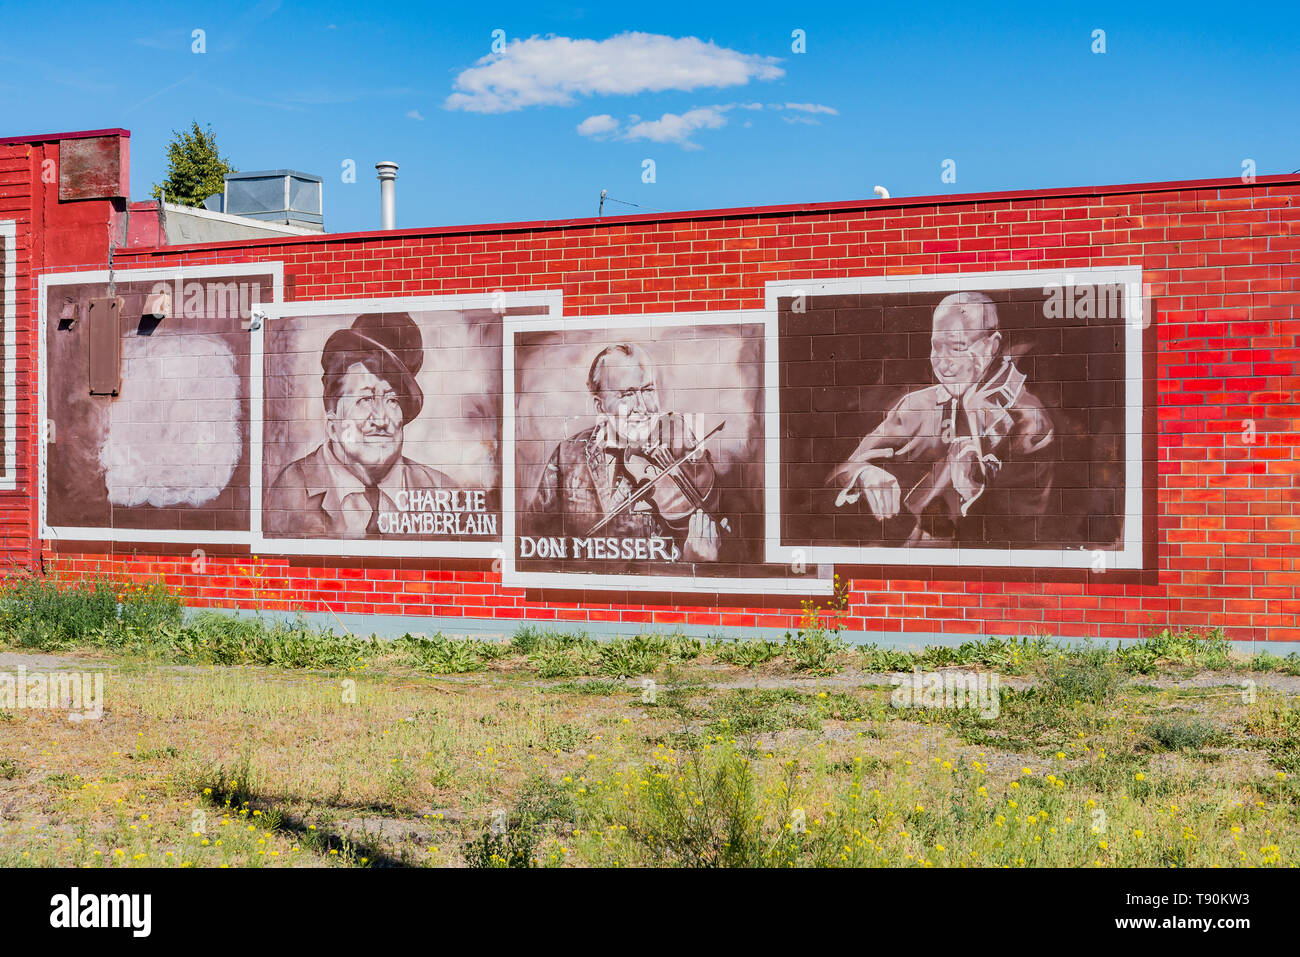 Charlie Chamberlain y Don Messer de Música Country Mural, Merritt, British Columbia, Canadá Foto de stock